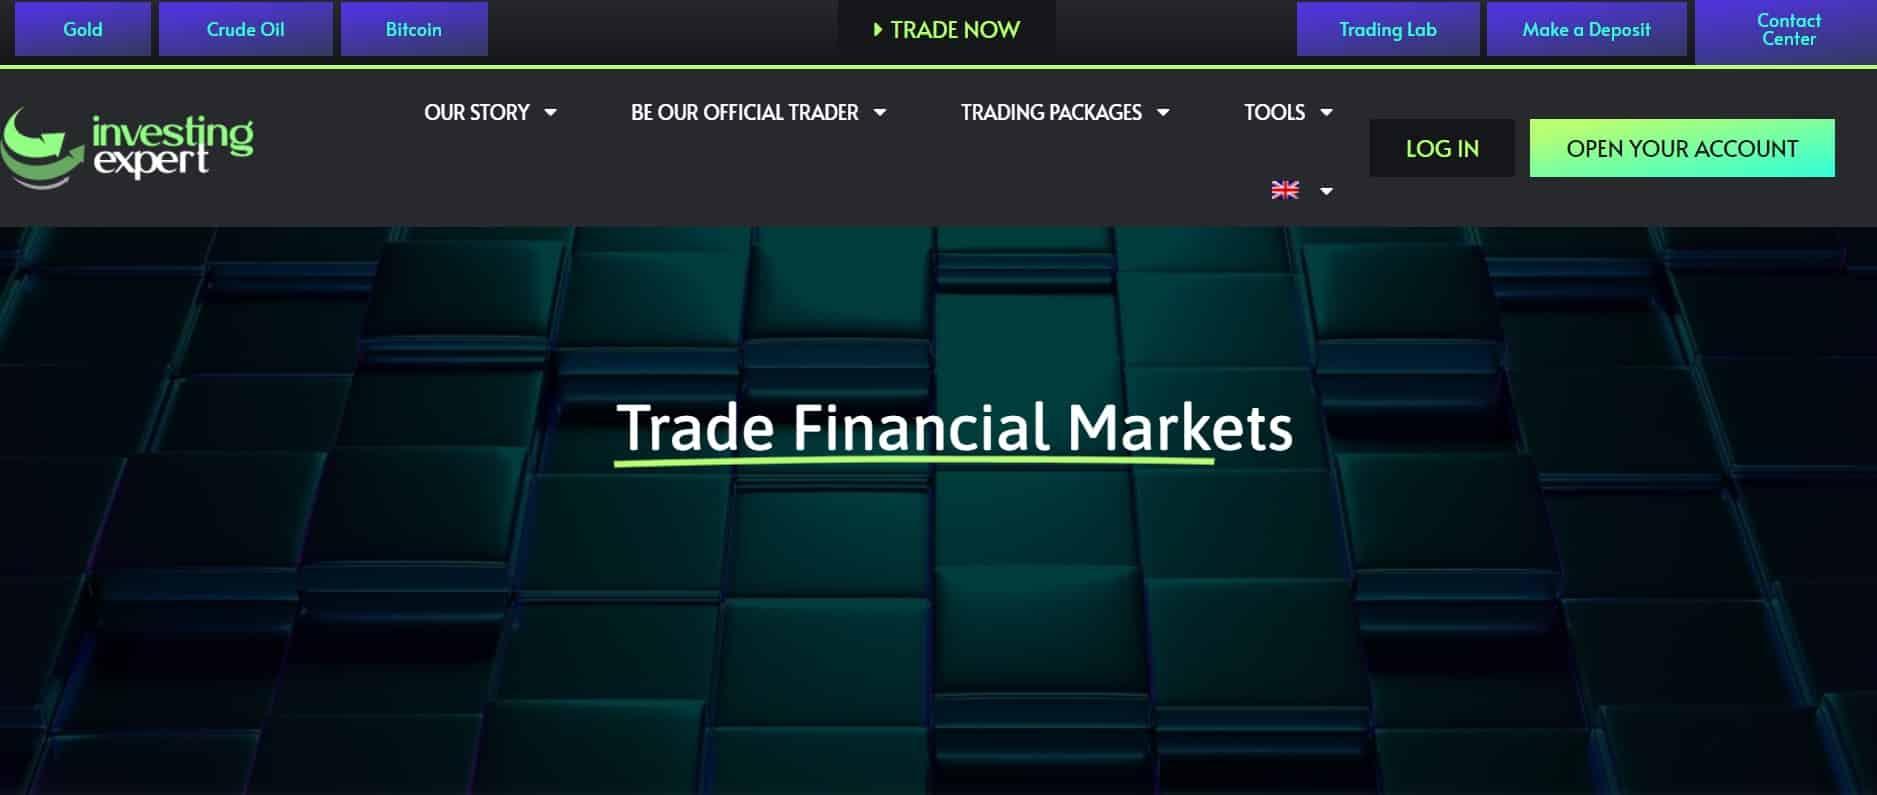 Investing Expert website